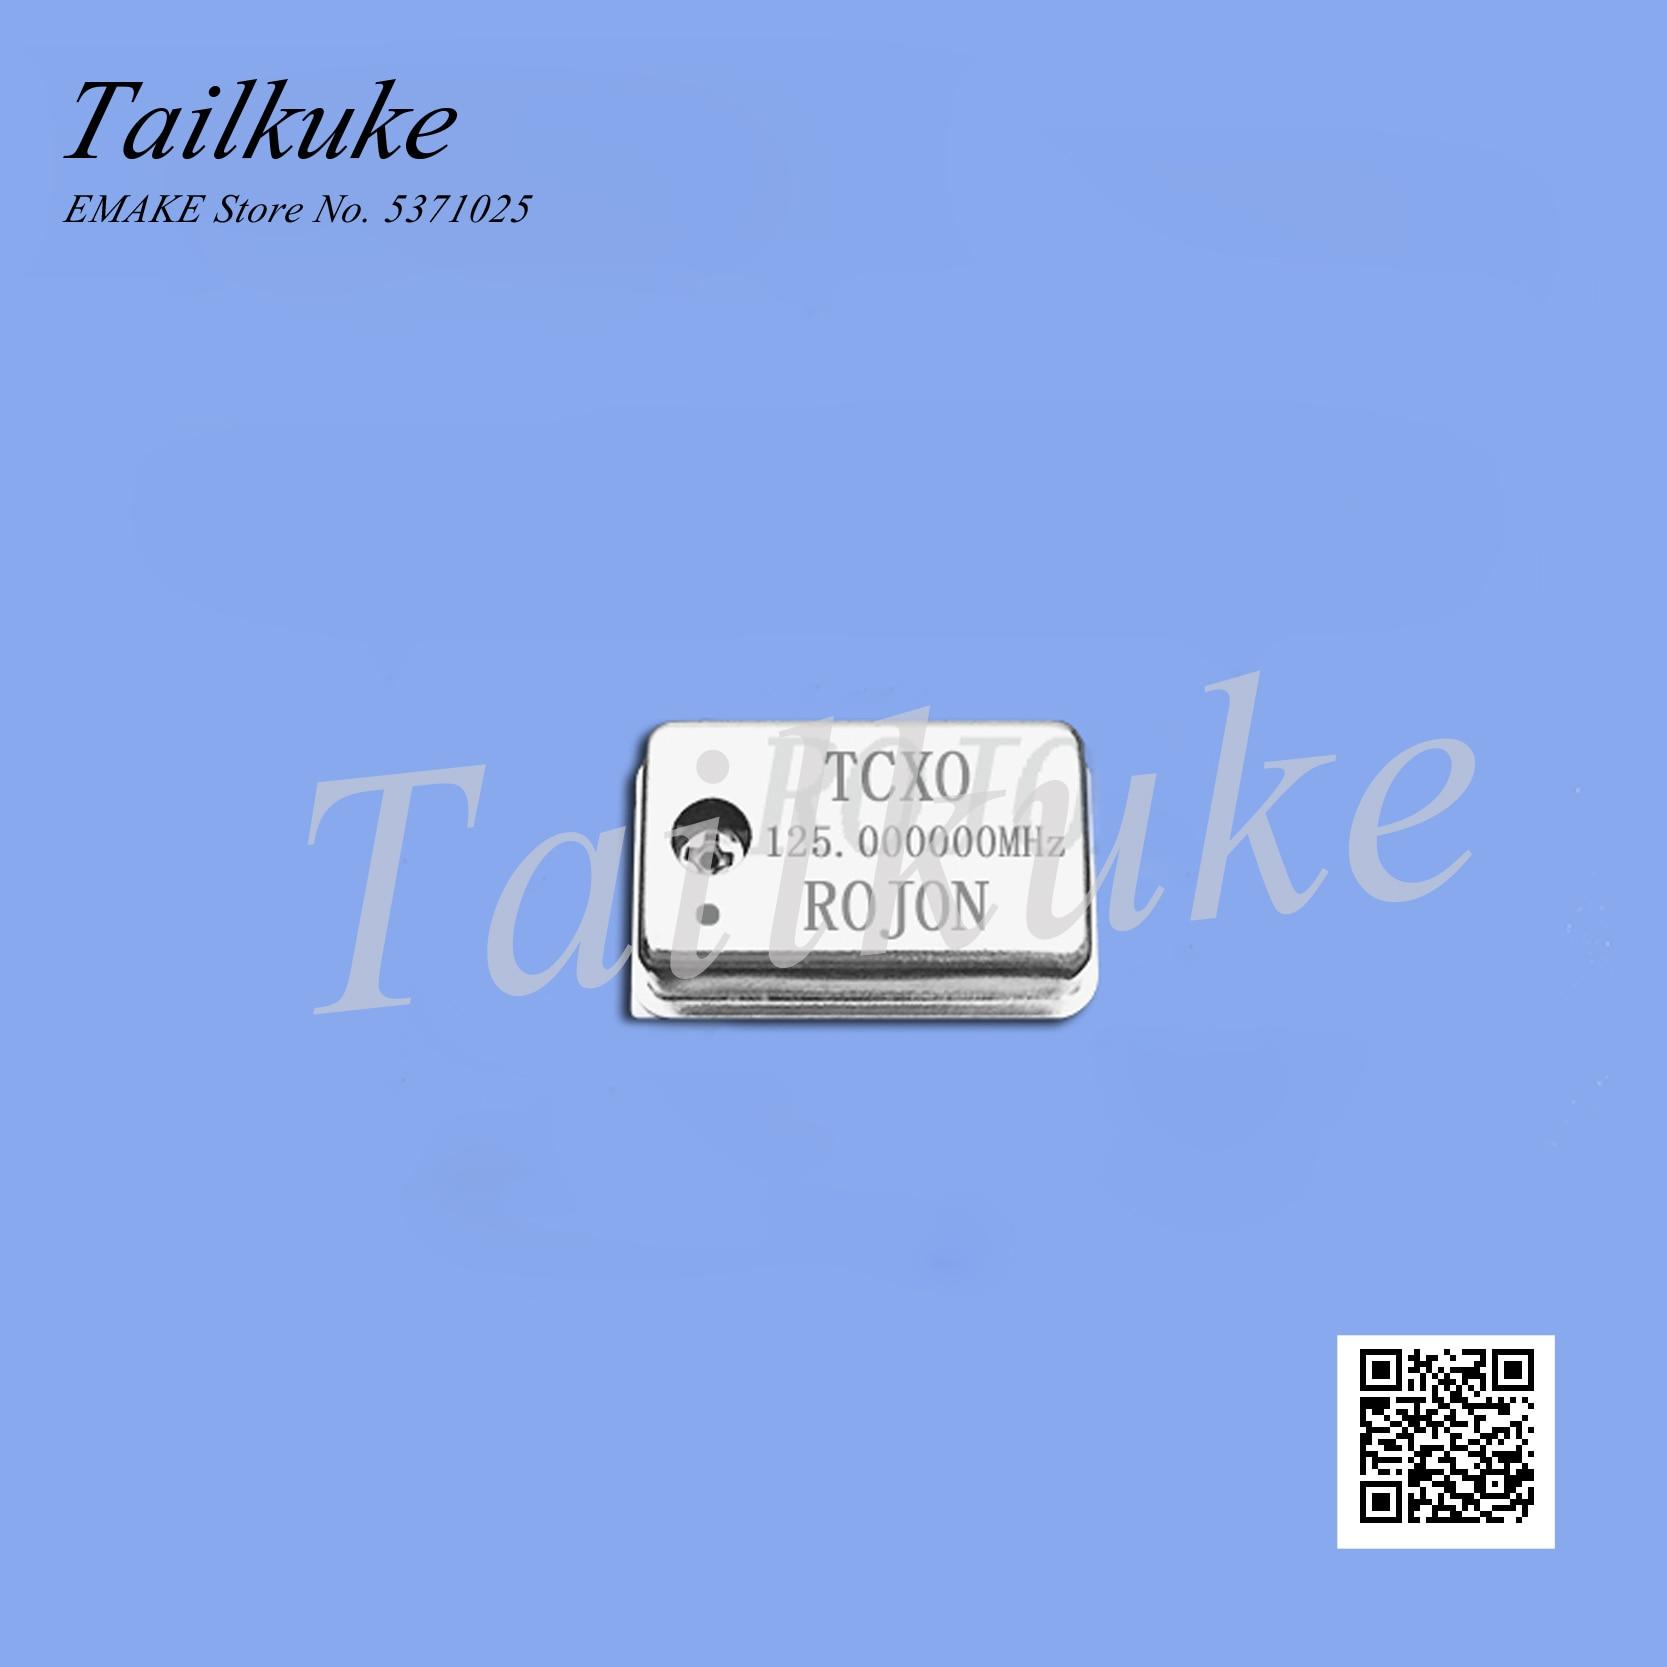 Tcxo alta precisión temperatura compensada oscilador de cristal Rojon 125MHz 0.1ppm reloj de alta estabilidad